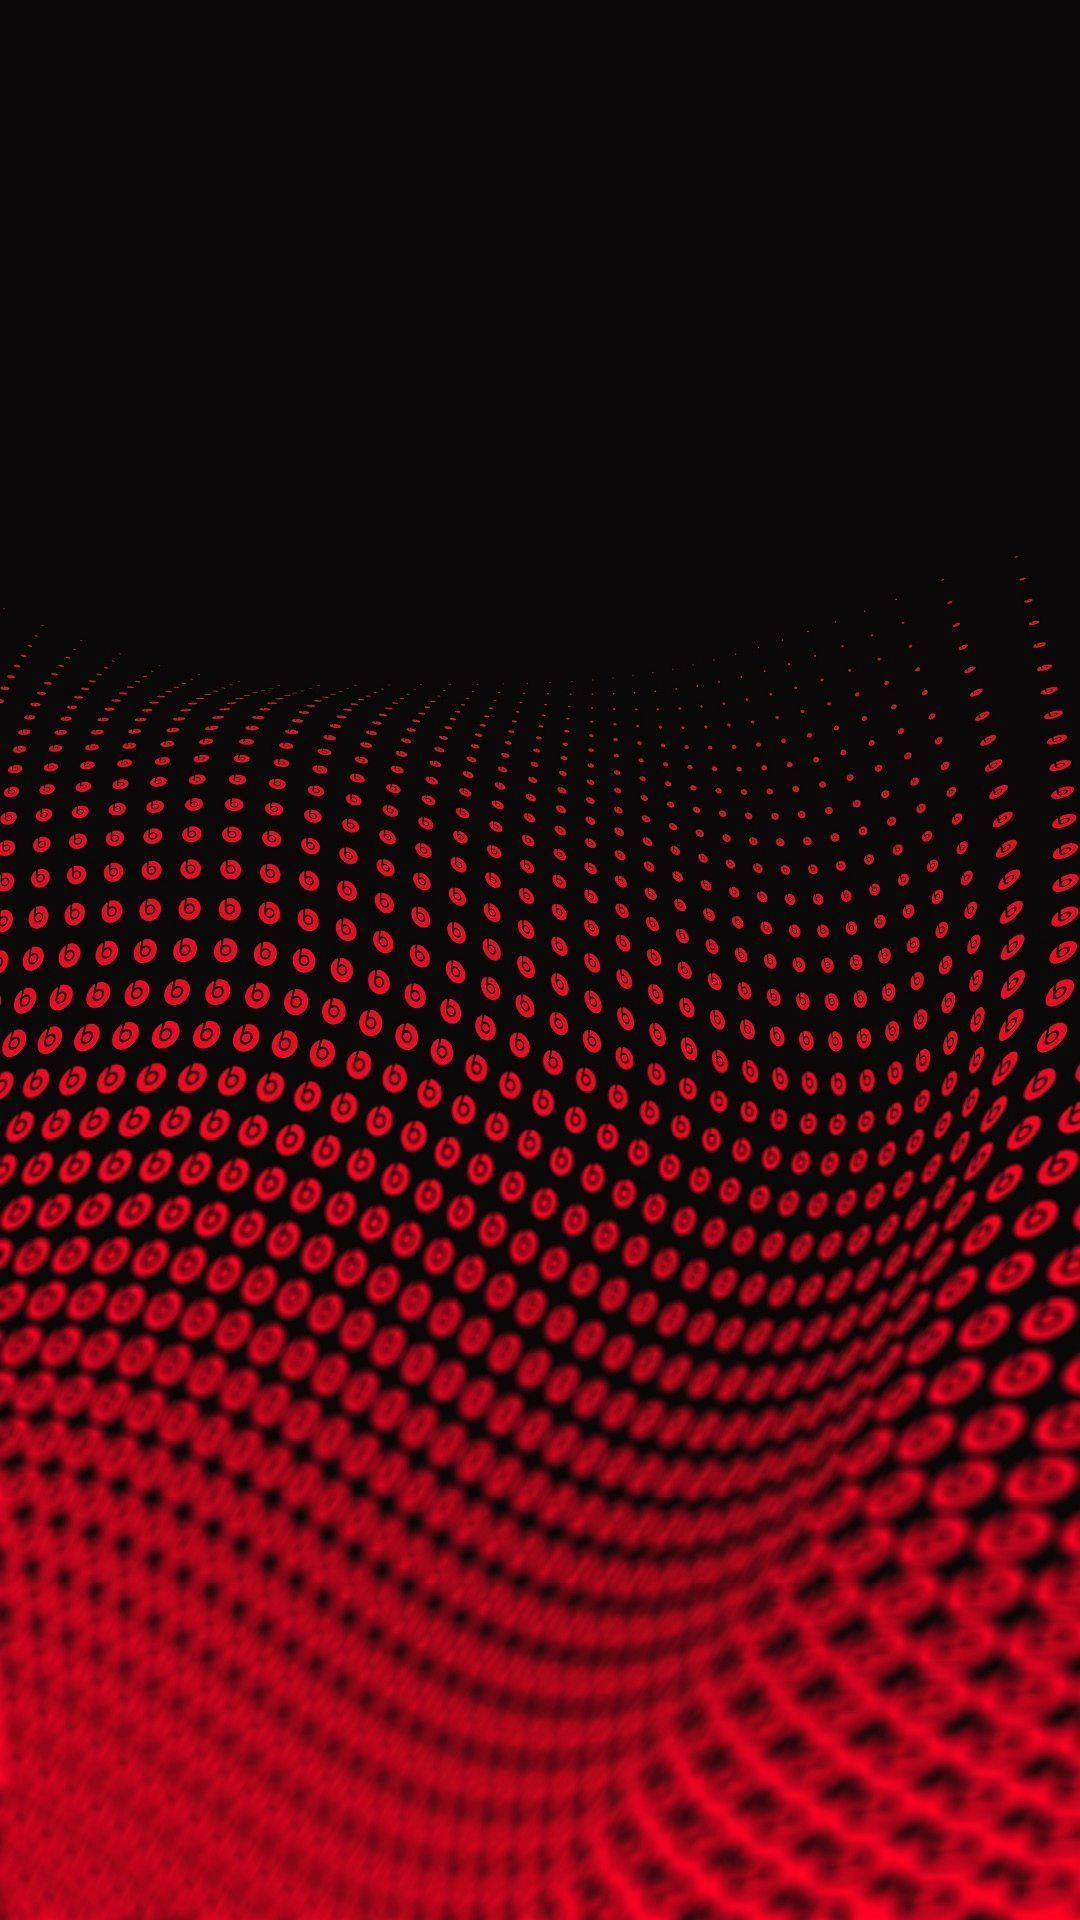 Hd wallpaper 1080x1920 - Wallpaper Full Hd 1080 X 1920 Smartphone Red Wave 3d Abstract